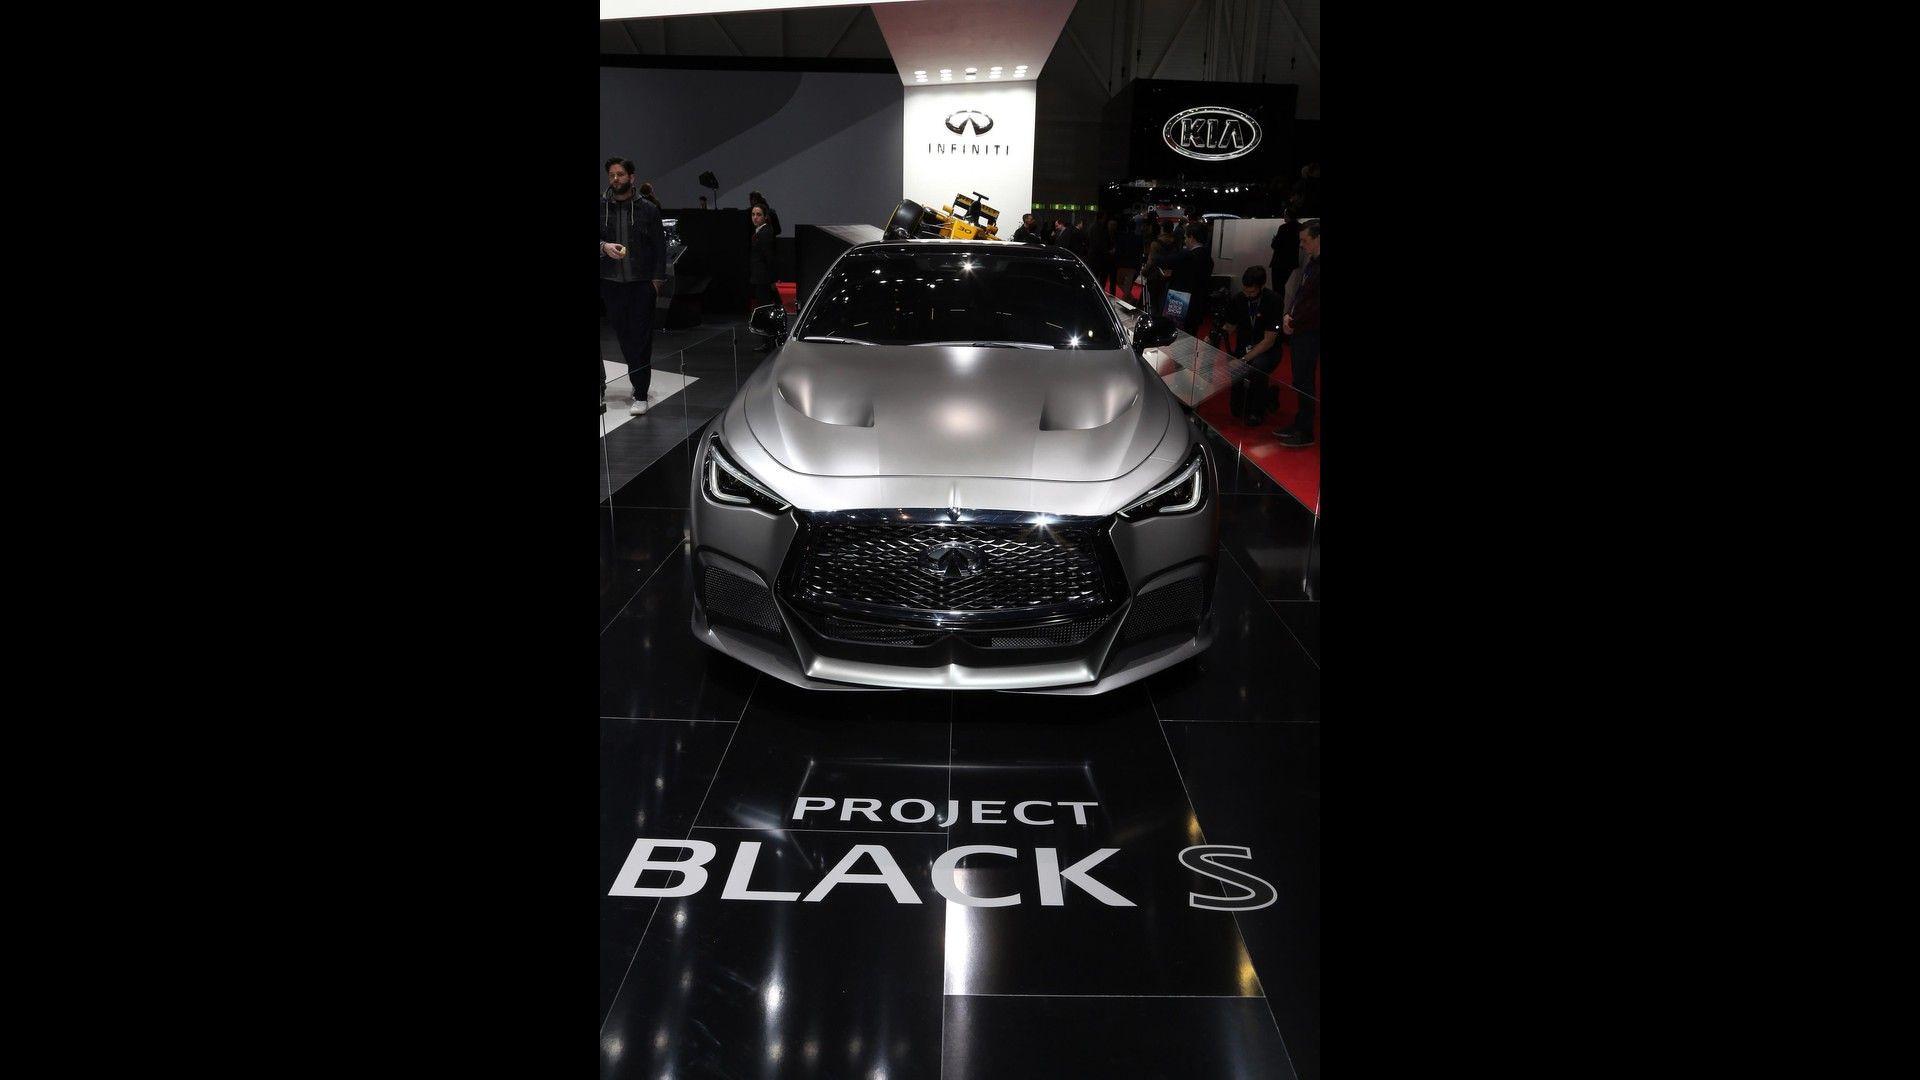 infiniti-q60-project-black-s-concept (7)